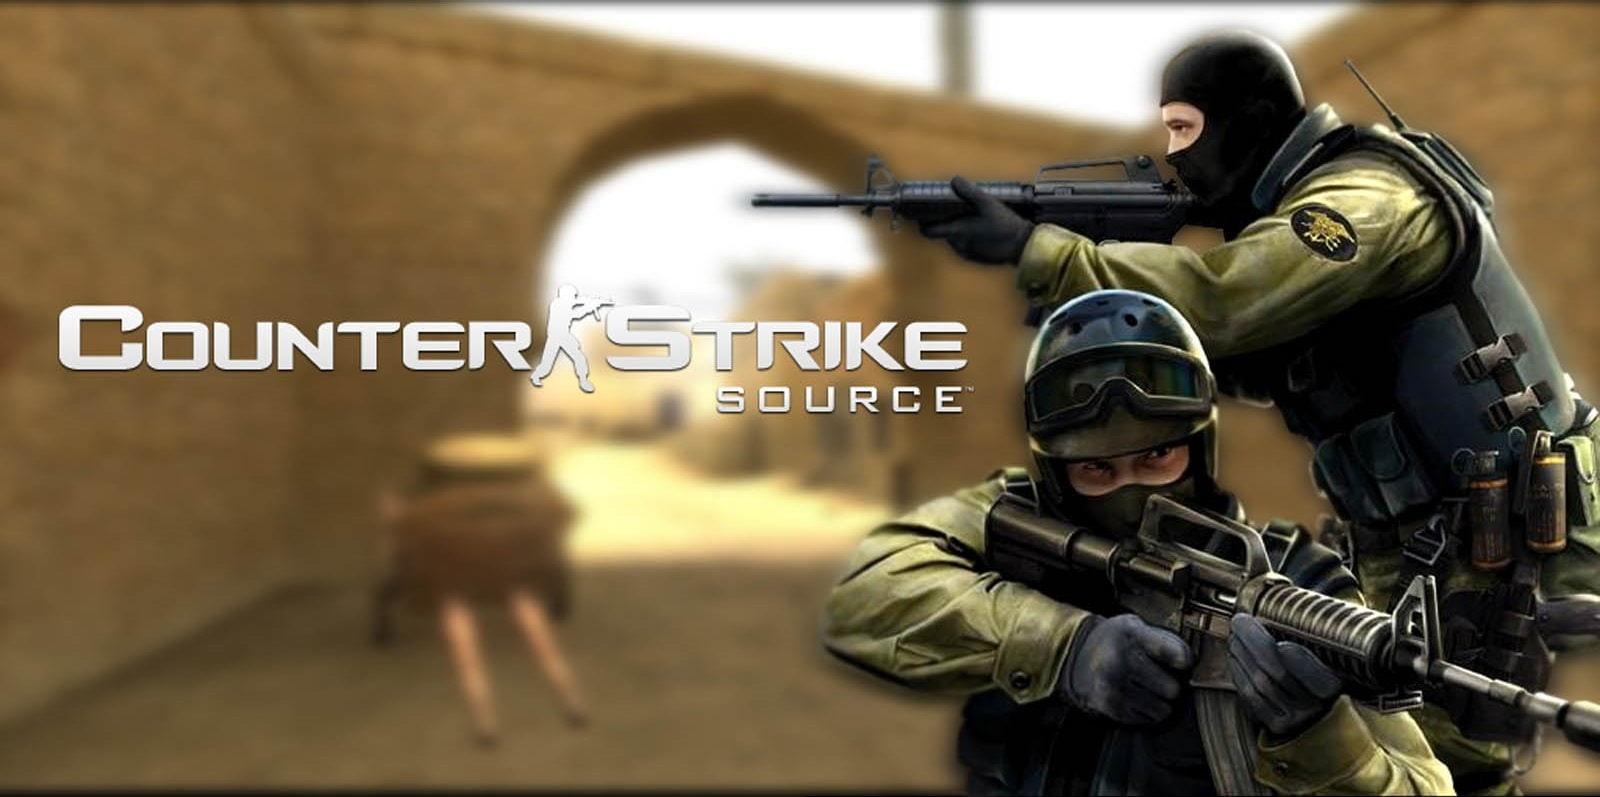 Counter-Strike: Source Desktop wallpapers